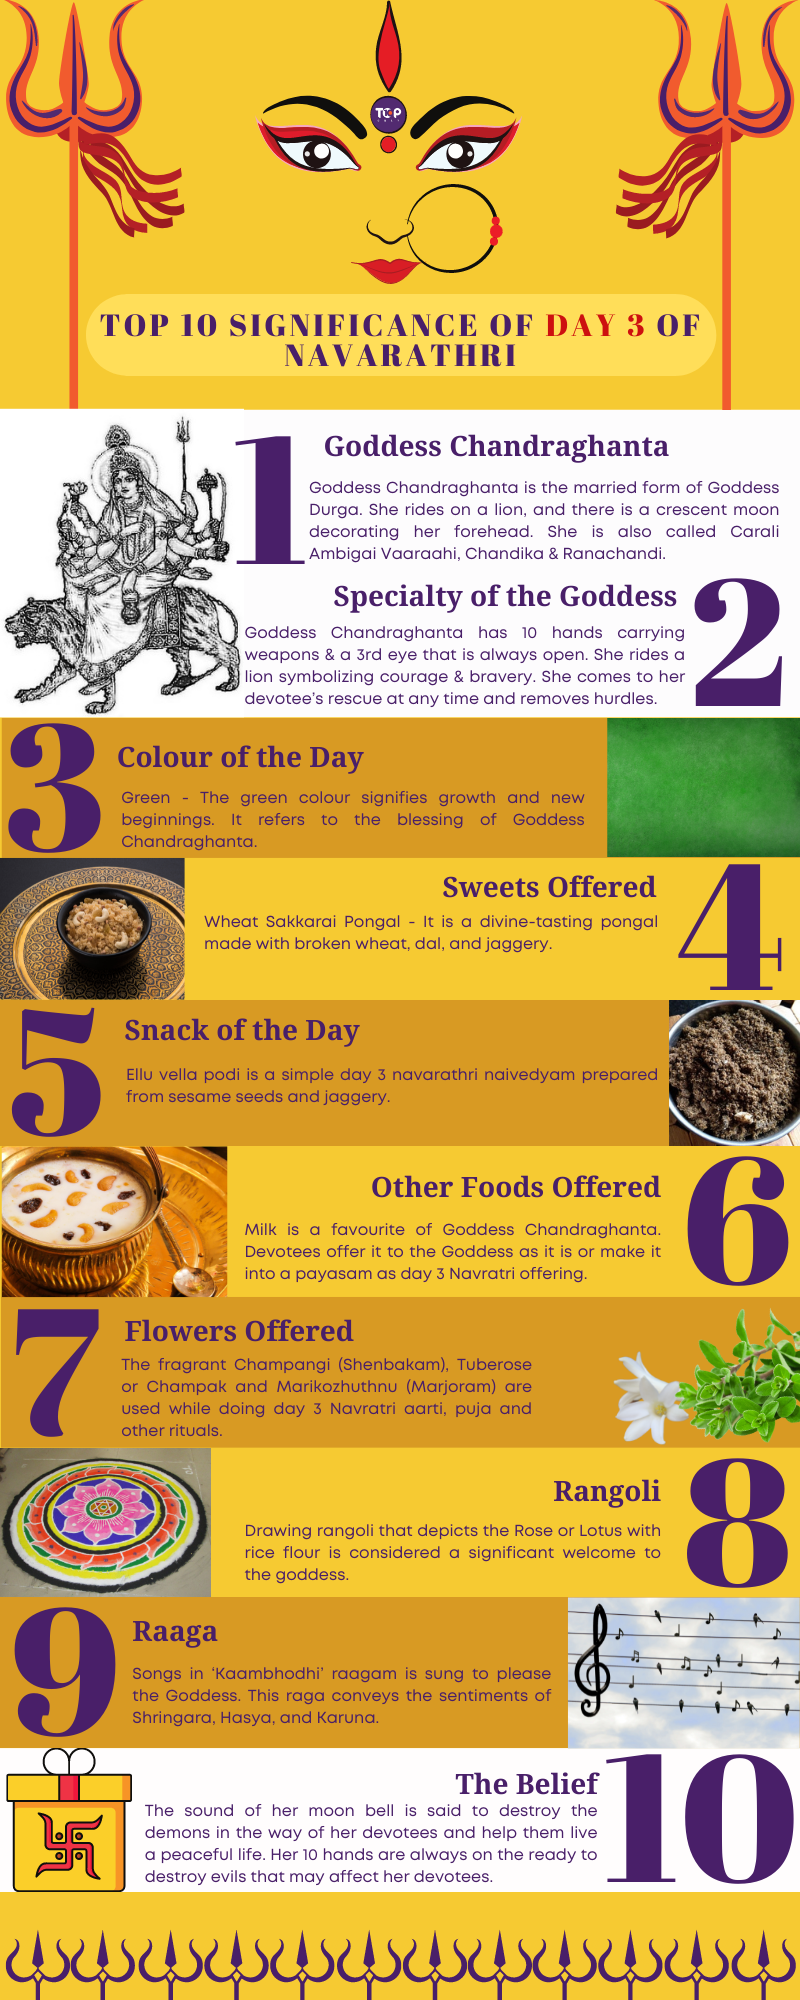 Significance of Day 3 of Navarathri